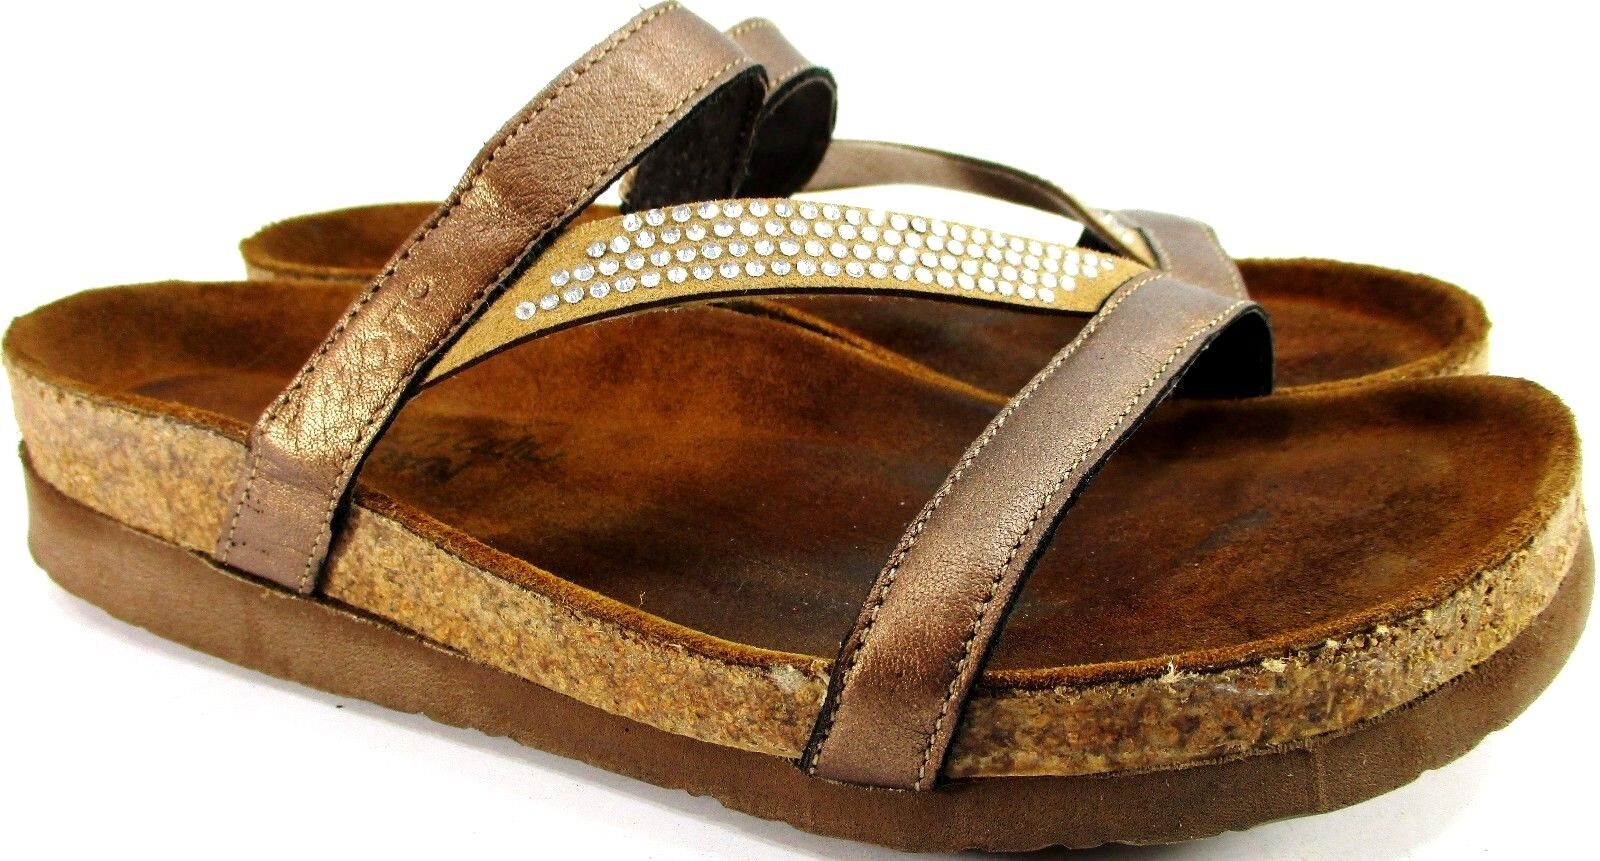 Naot donna Sandals Dimensione 9 Euro 39 Bronze Rhinestone Cork Leather Footbed